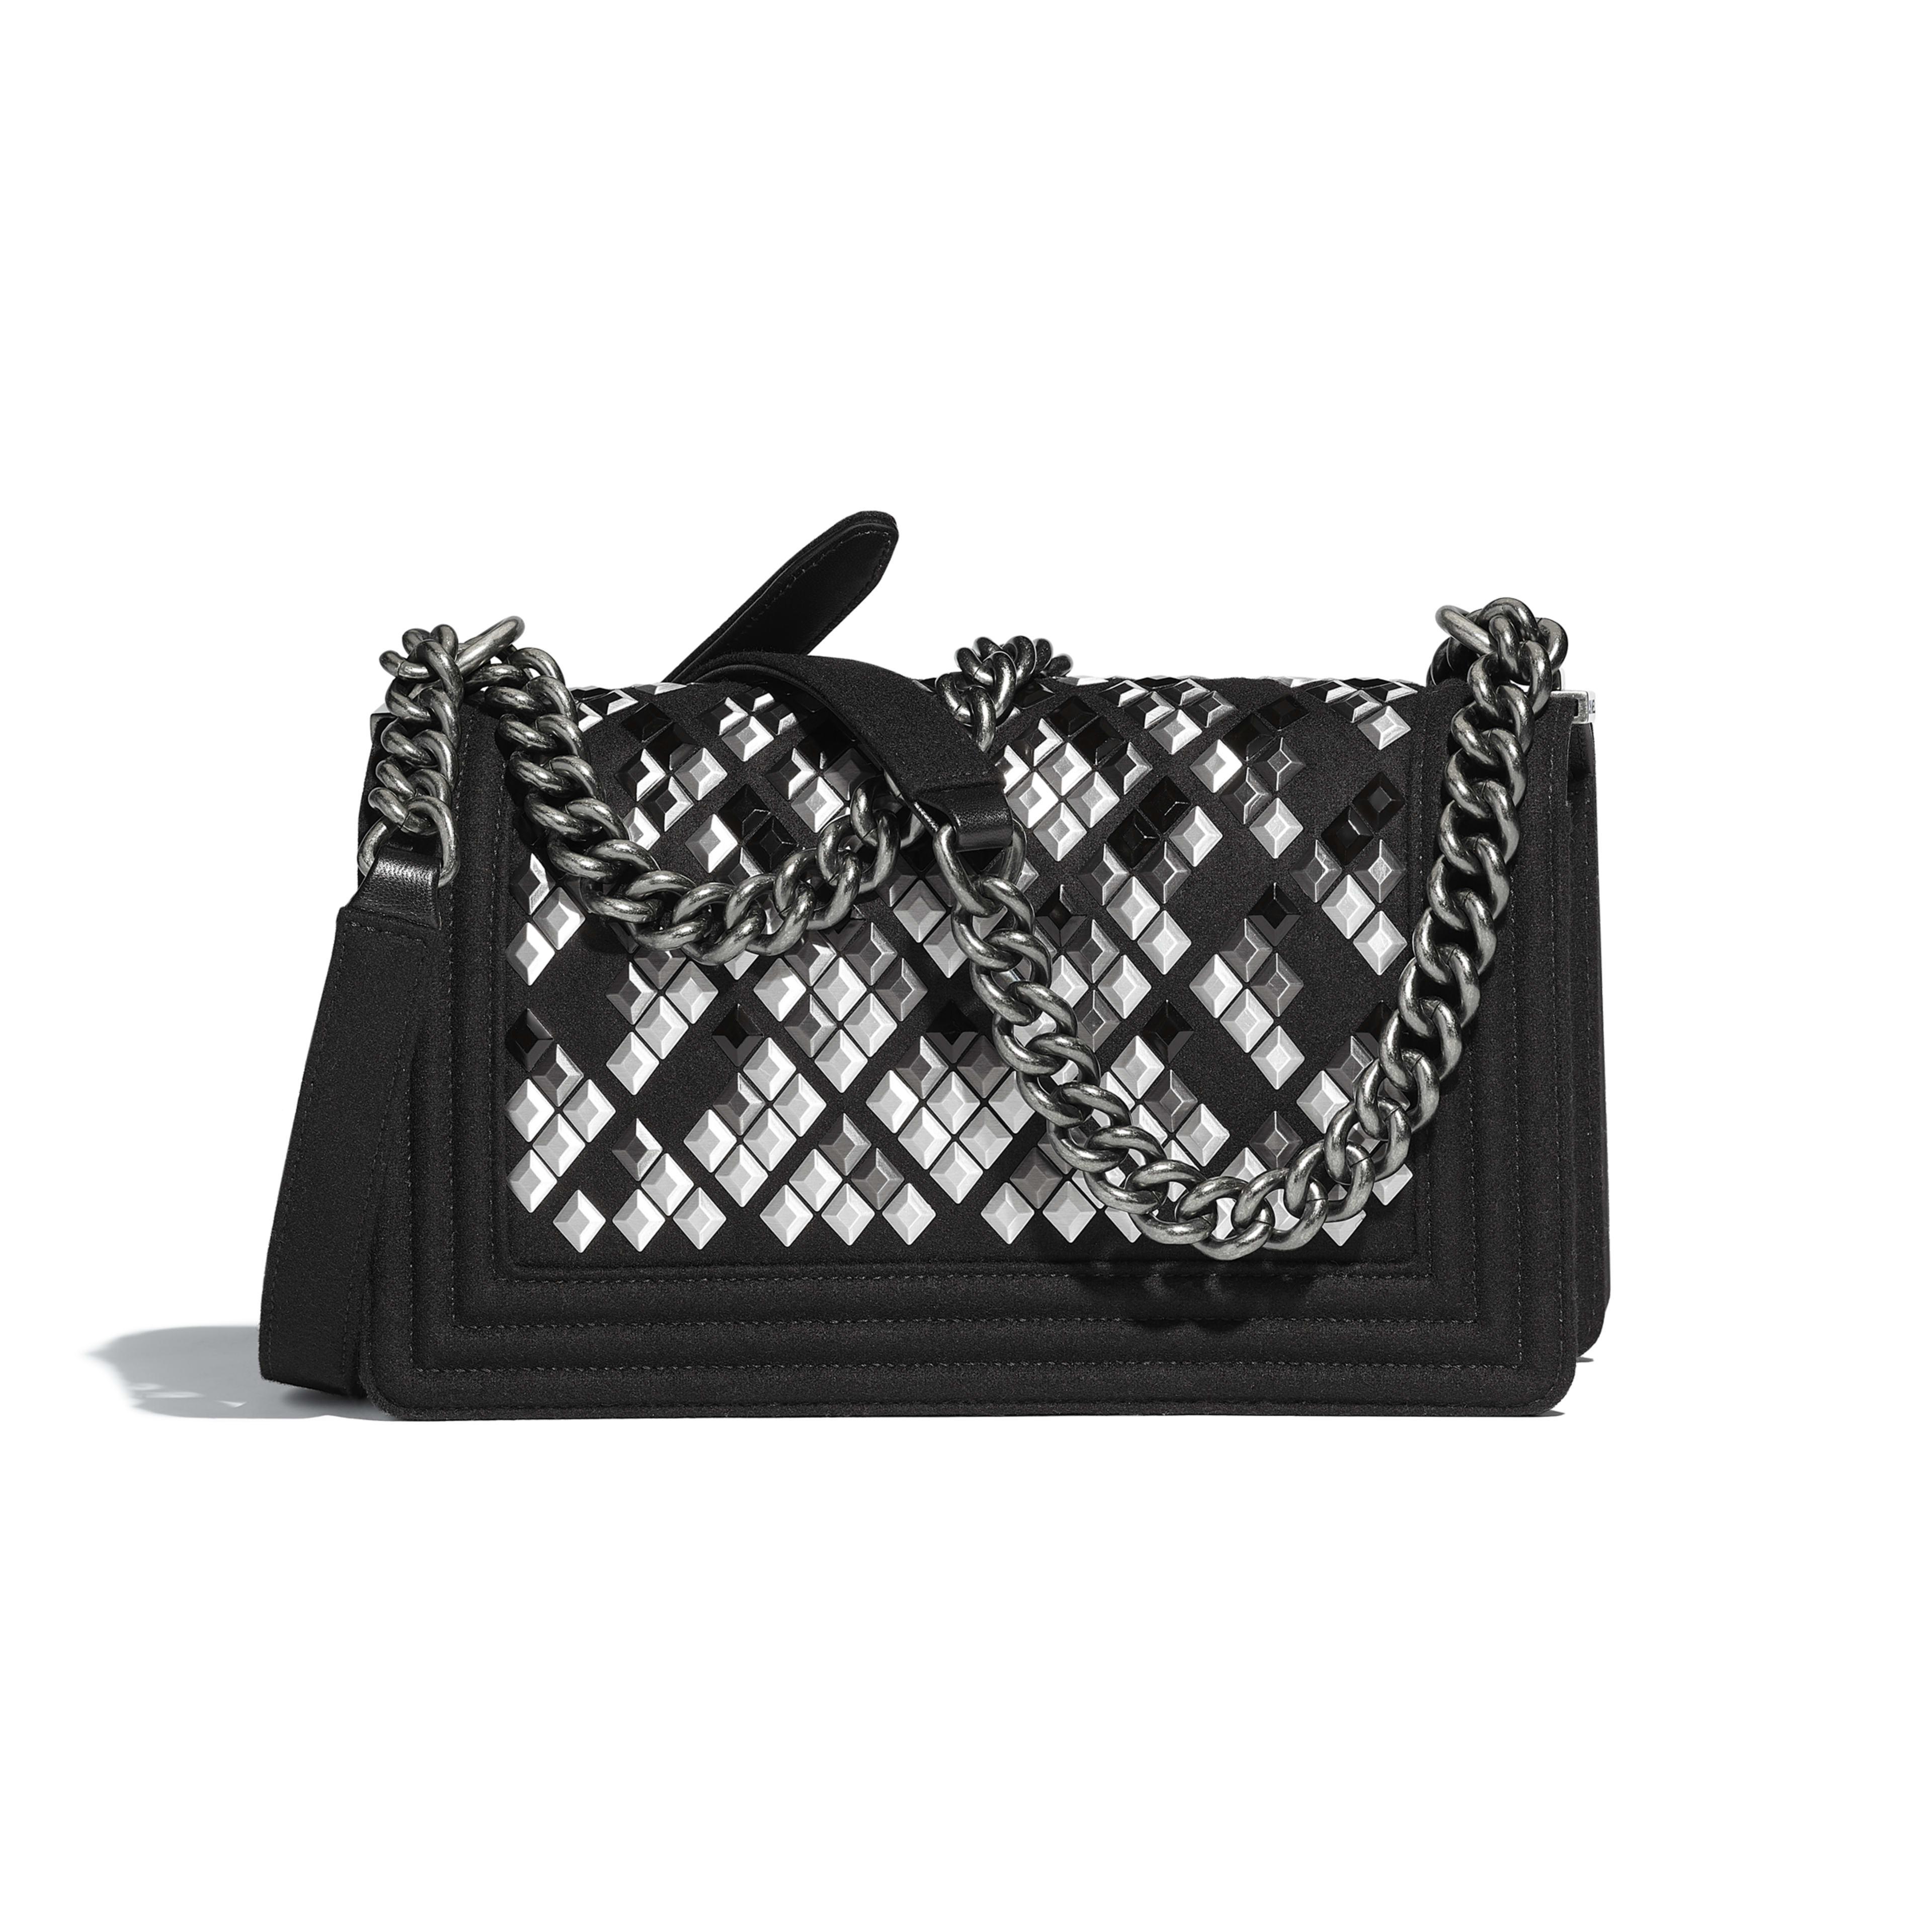 BOY CHANEL Handbag Embroidered Wool, Lambskin & Ruthenium-Finish Metal Black -                                       view 2 - see full sized version